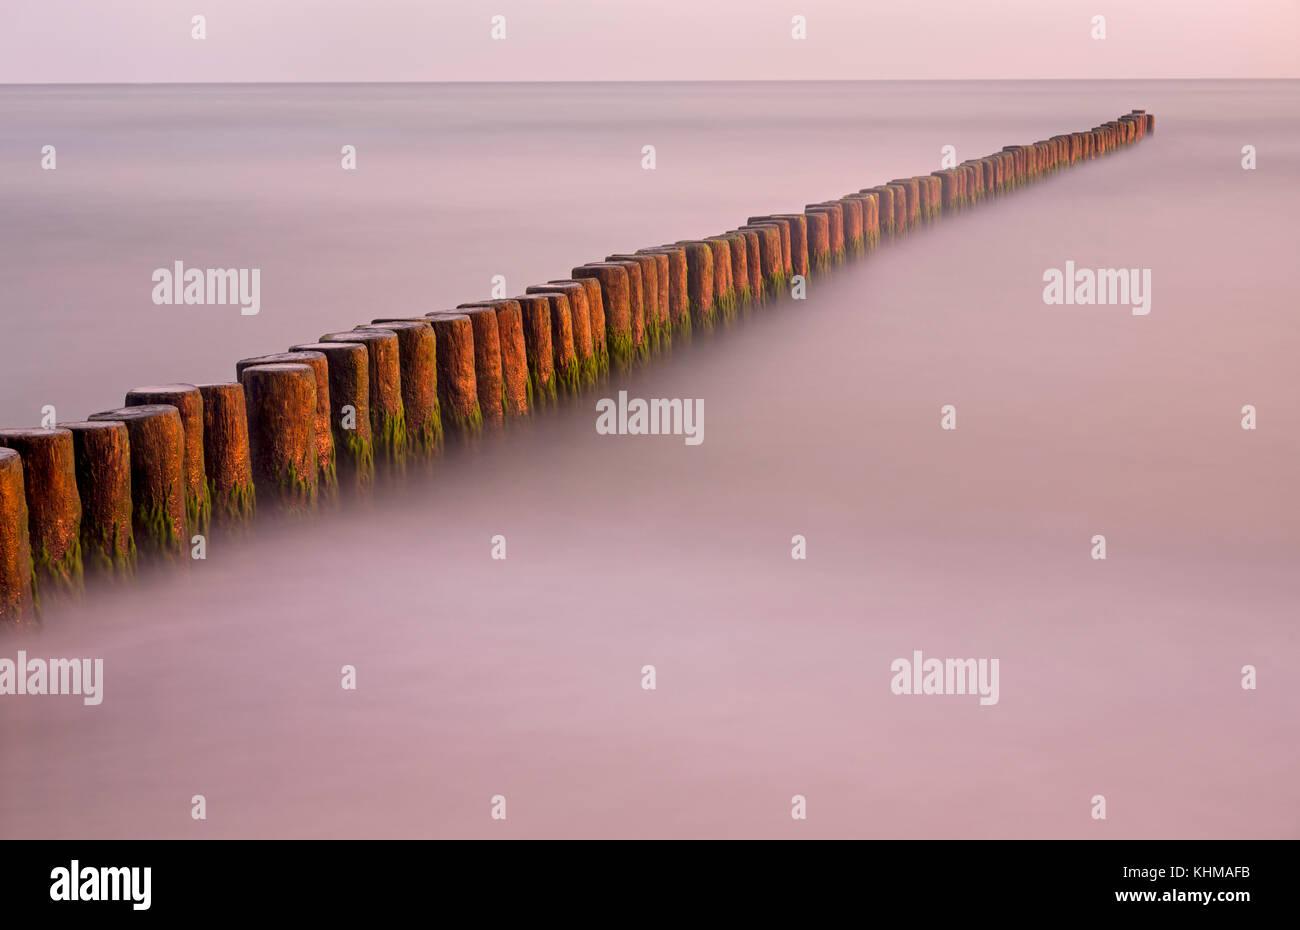 Groynes on the Baltic Coast, Mecklenburg-West Pomerania, Fishland-Darß-Zingst, Germany, Europe - Stock Image